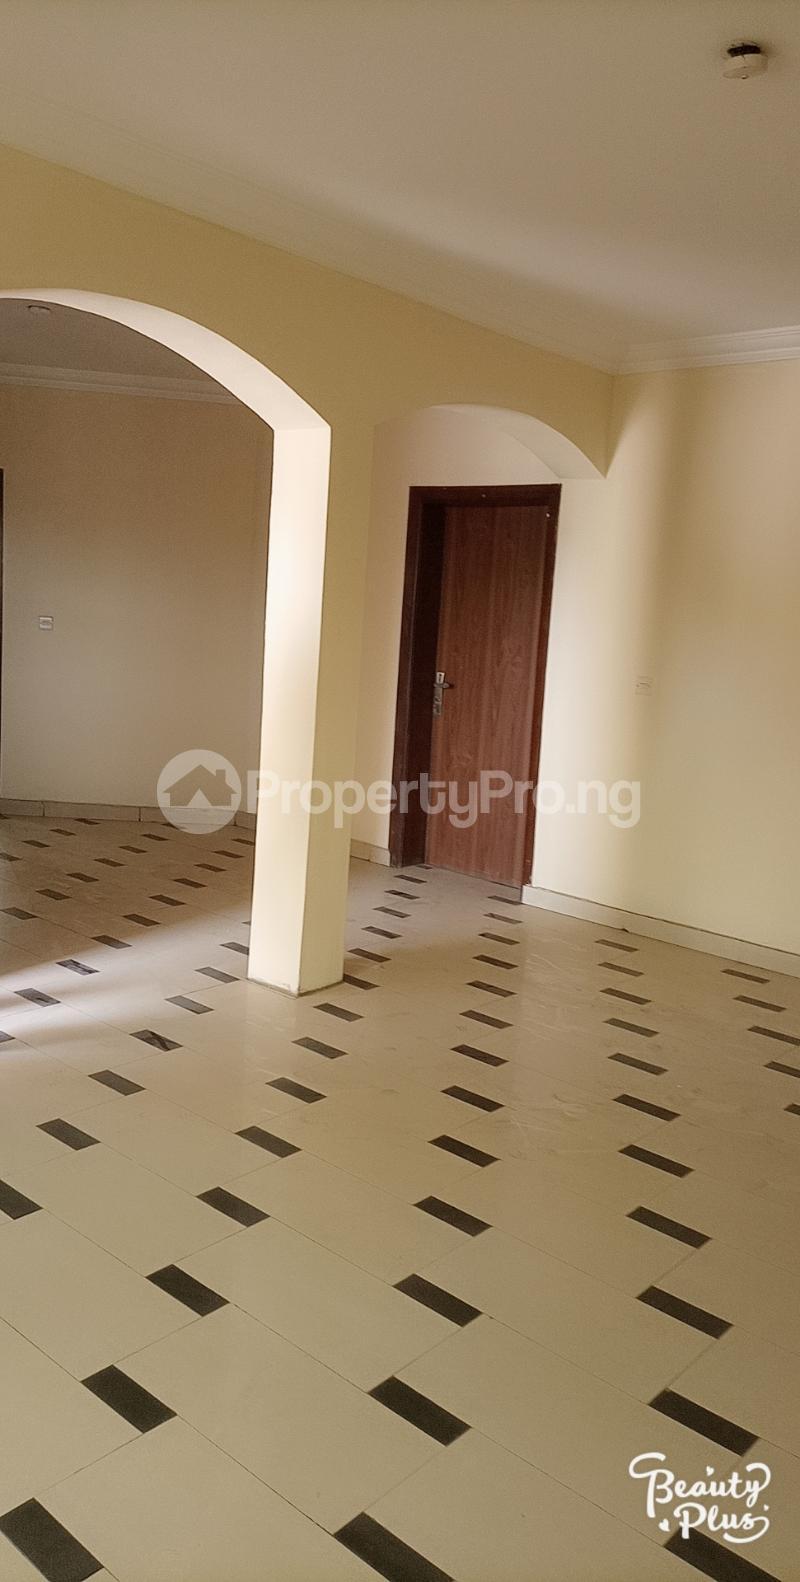 3 bedroom Flat / Apartment for rent Oke Afa isolo. Lagos Mainland Oke-Afa Isolo Lagos - 12